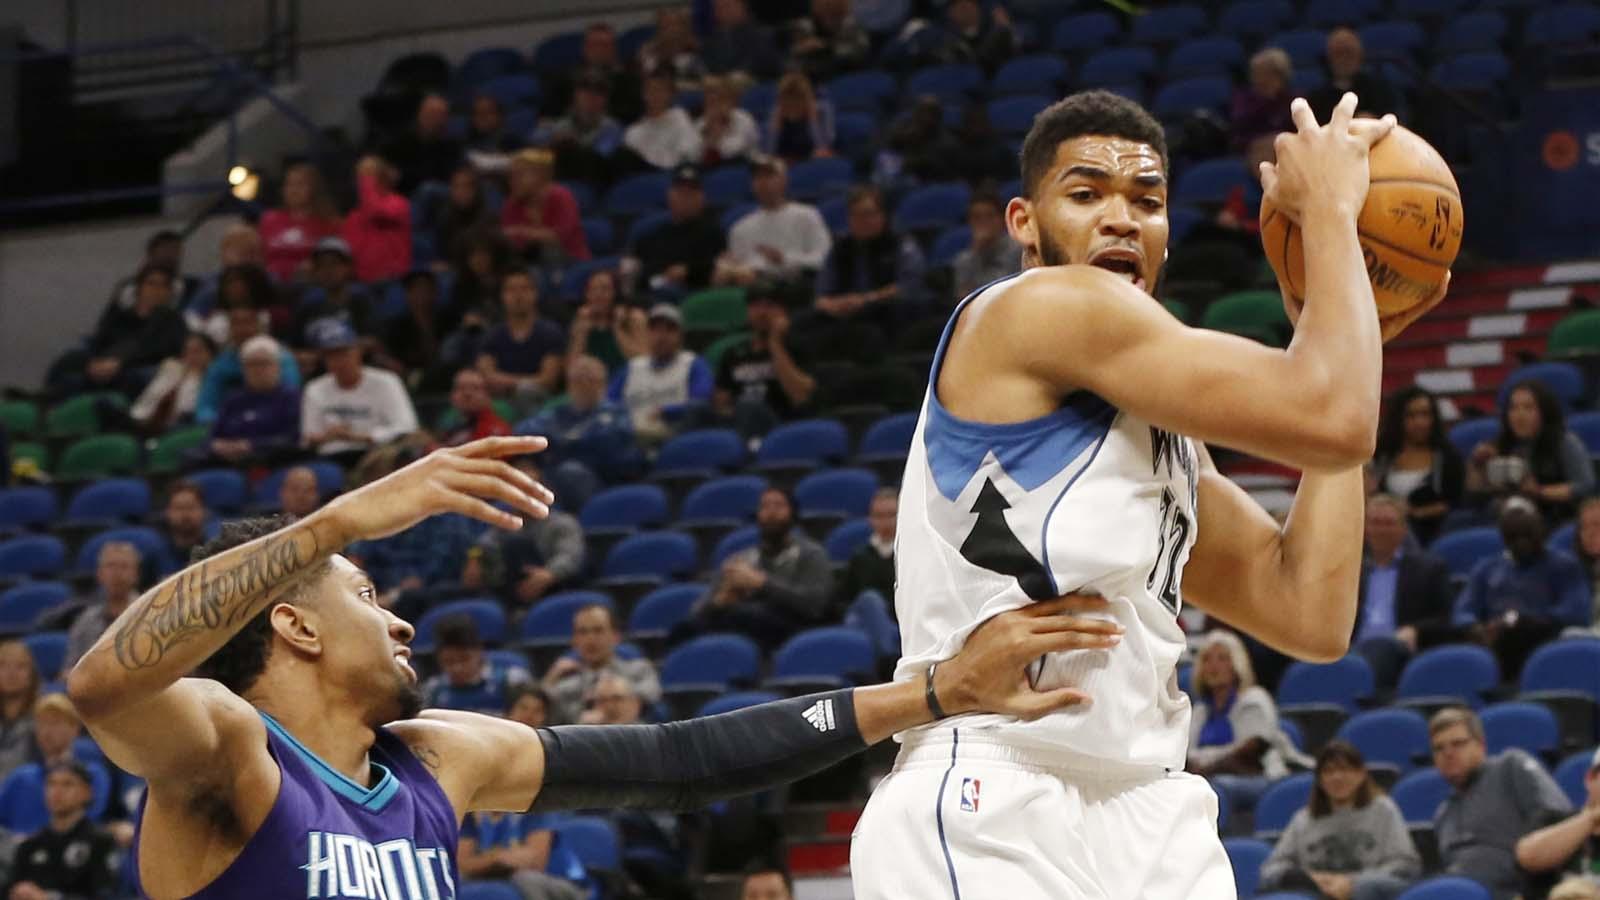 Timberwolves finish preseason by crushing Hornets